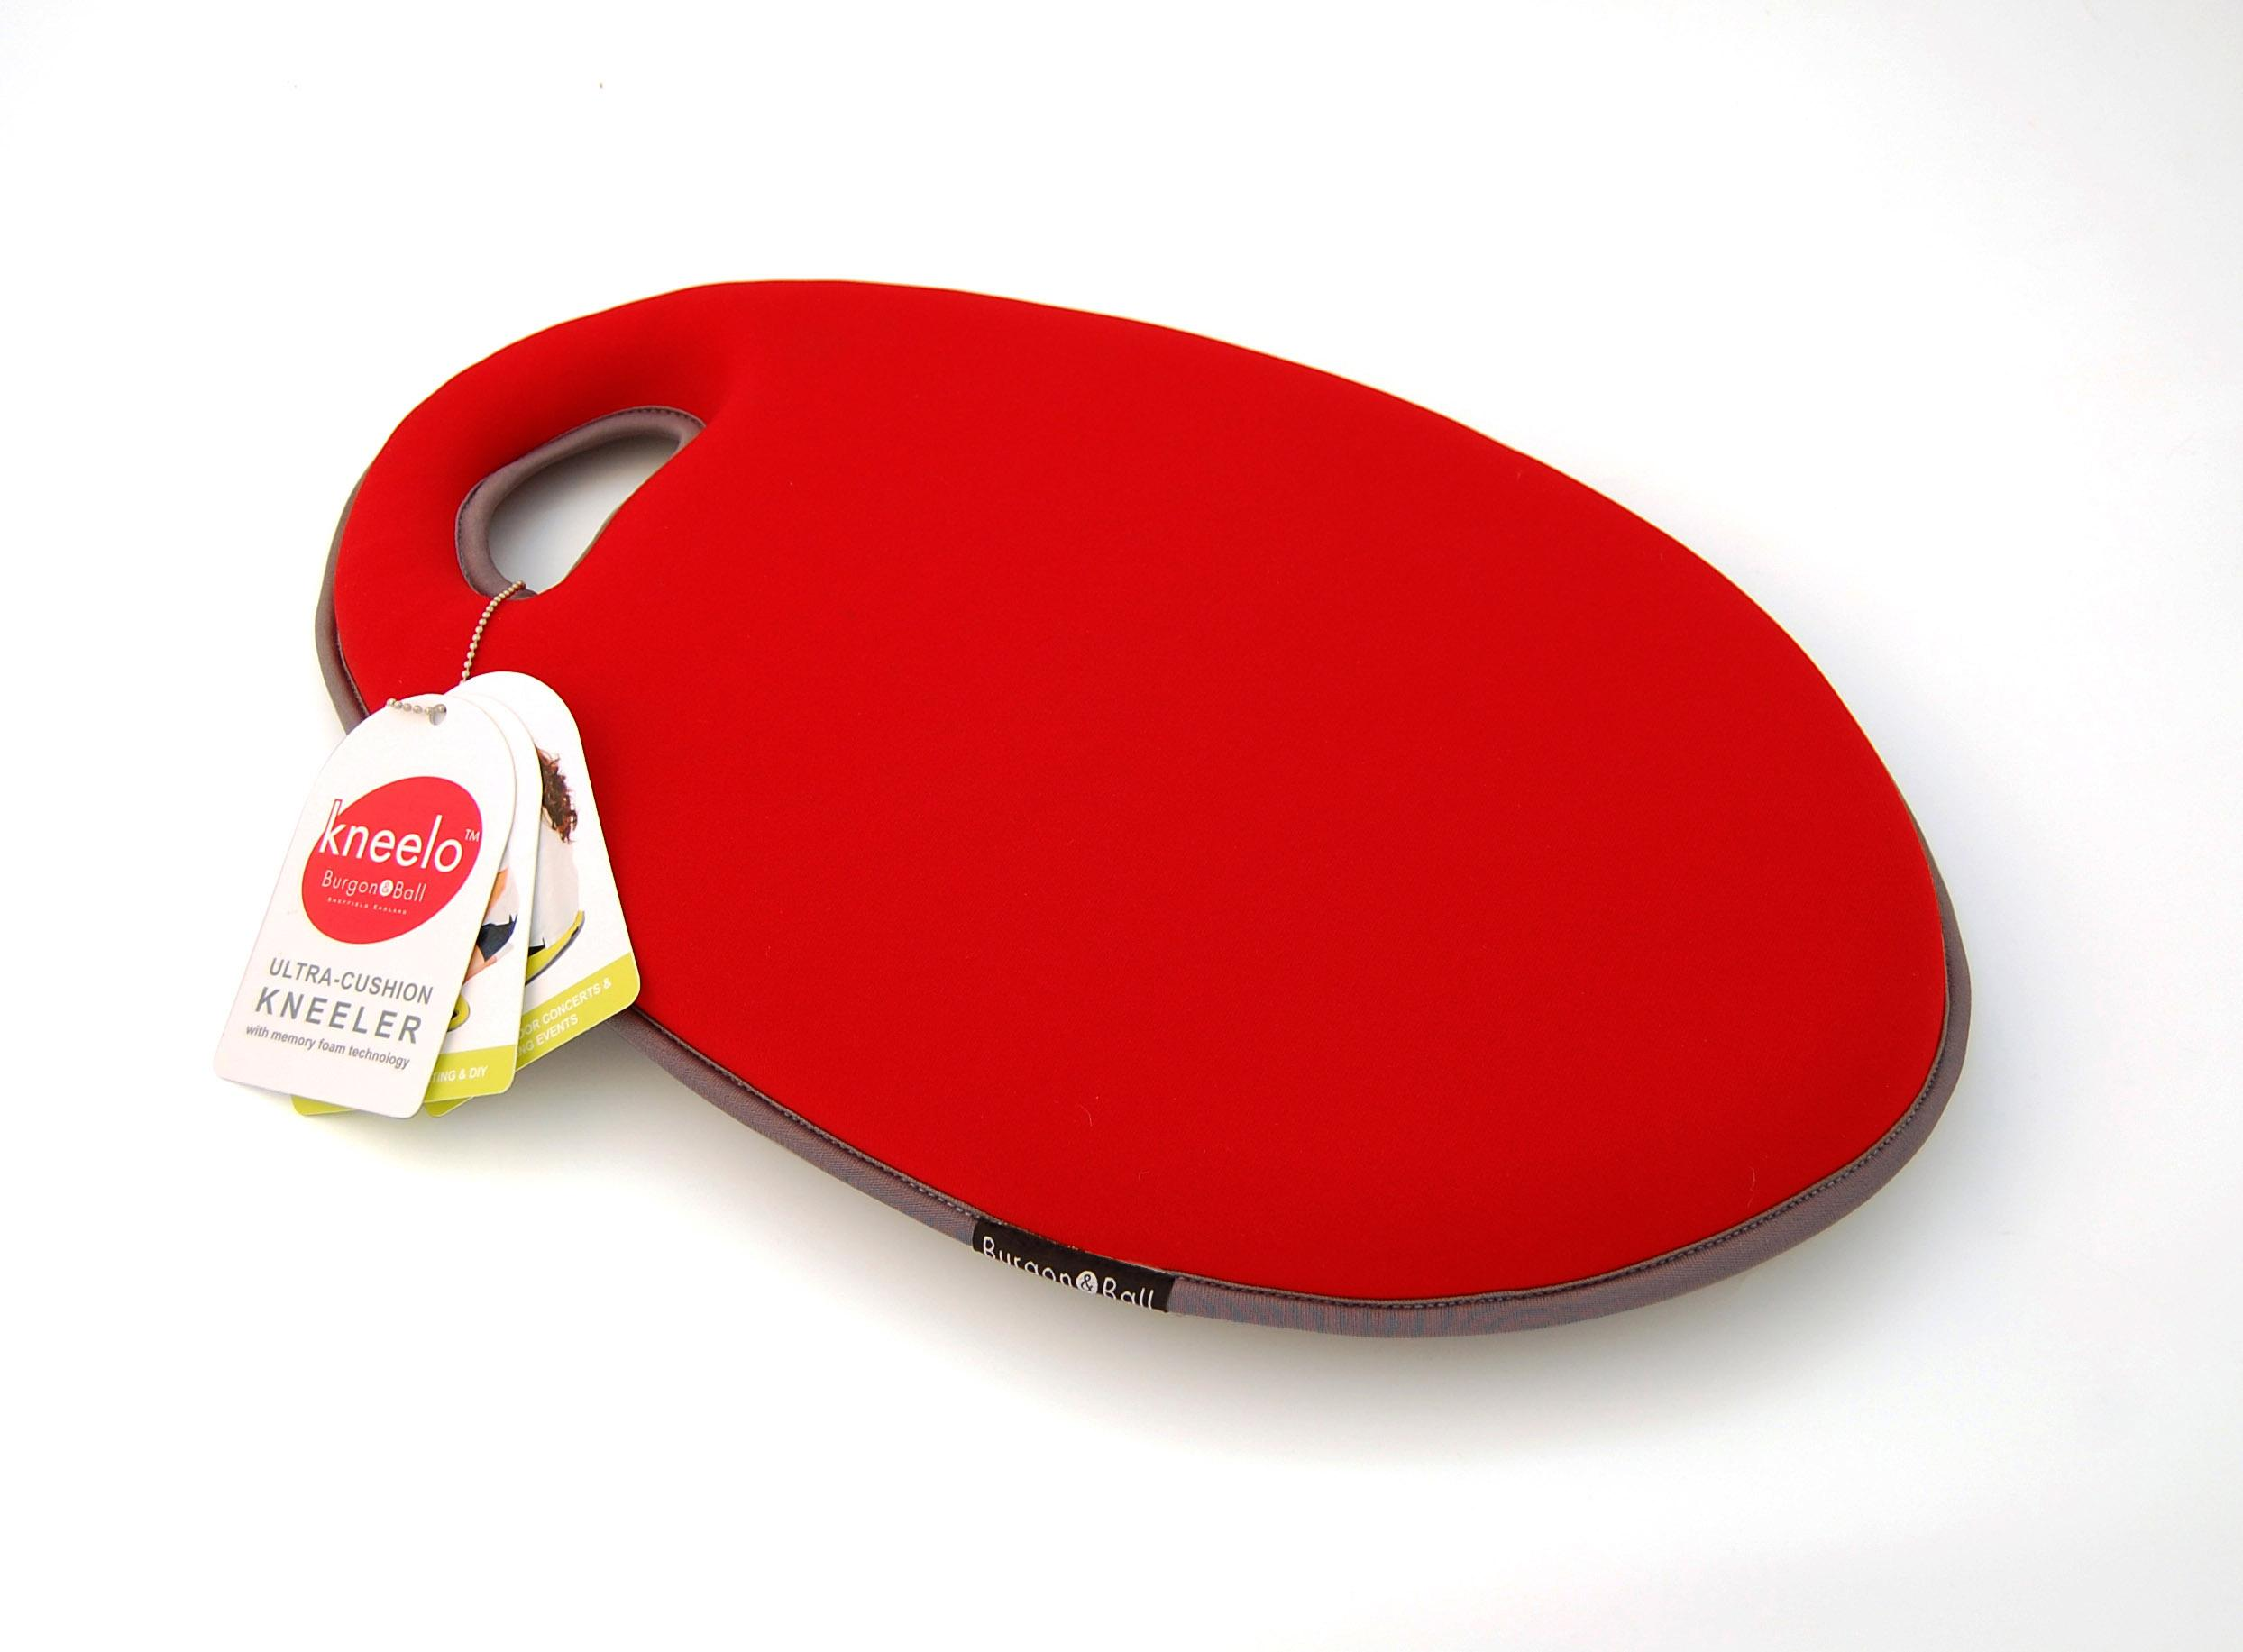 burgon ball kneelo poppy. Black Bedroom Furniture Sets. Home Design Ideas